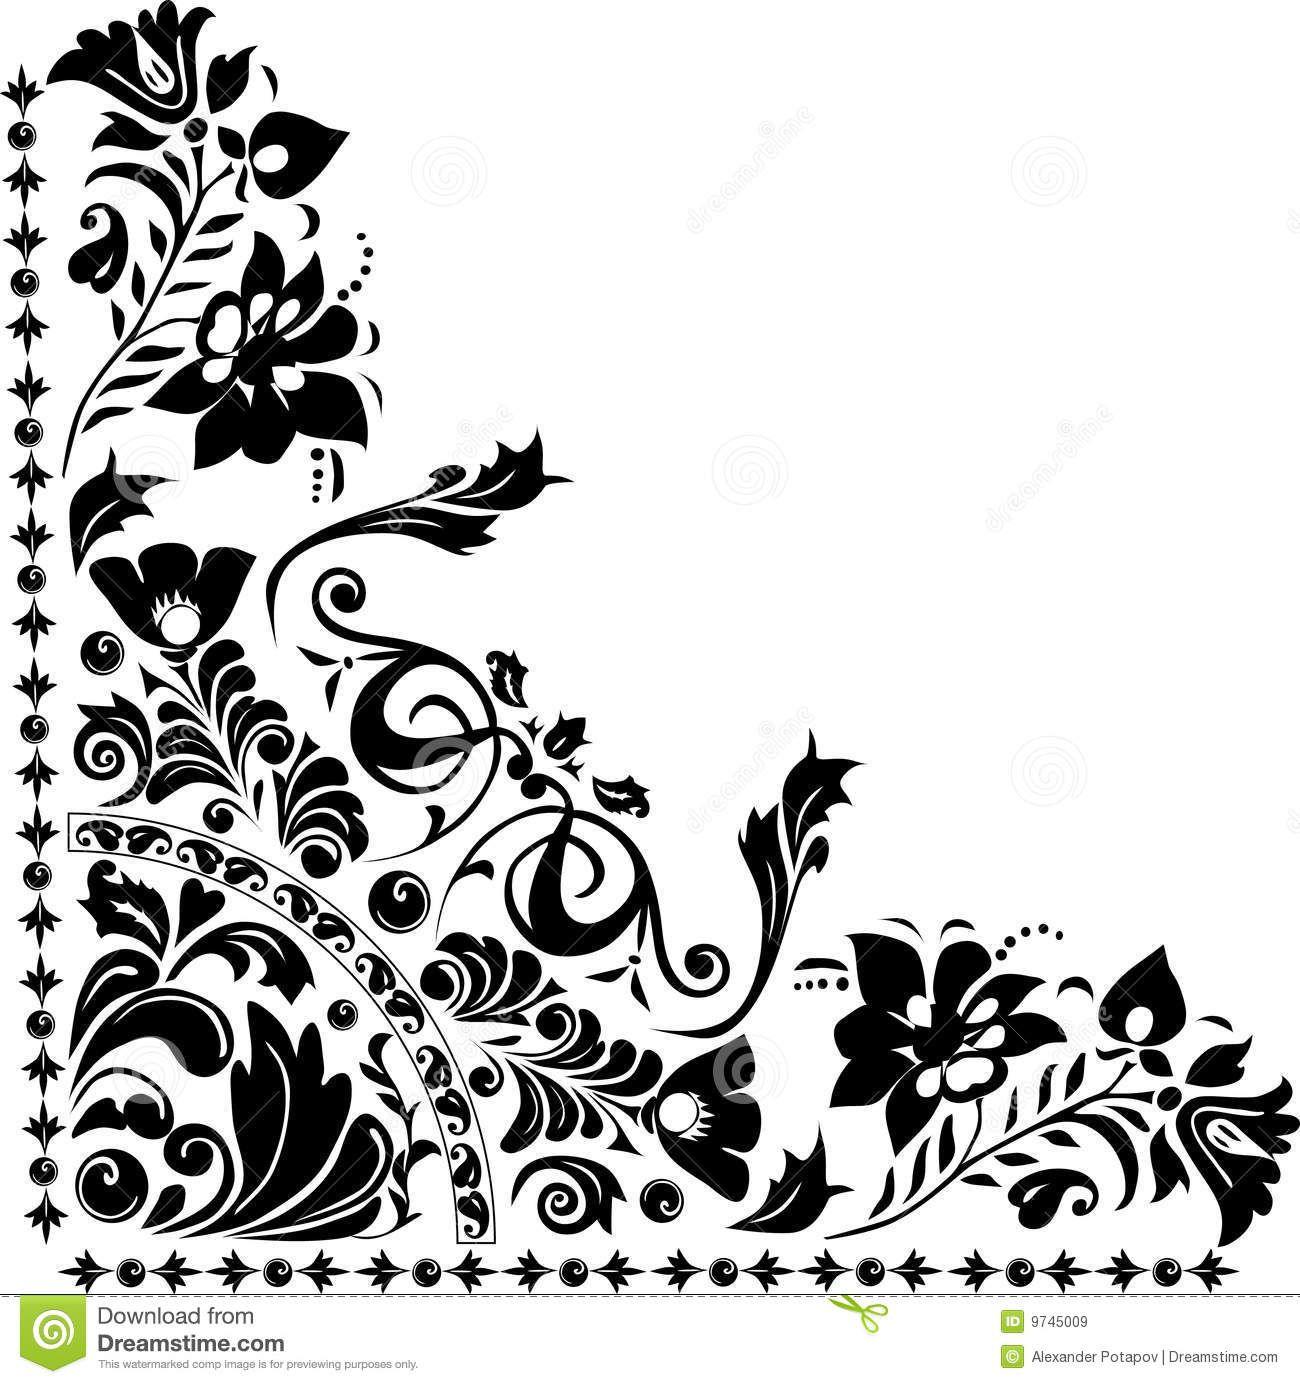 Black Flower Silhouette Pattern Royalty Free Stock Images: Silhouette Of Corner Flower